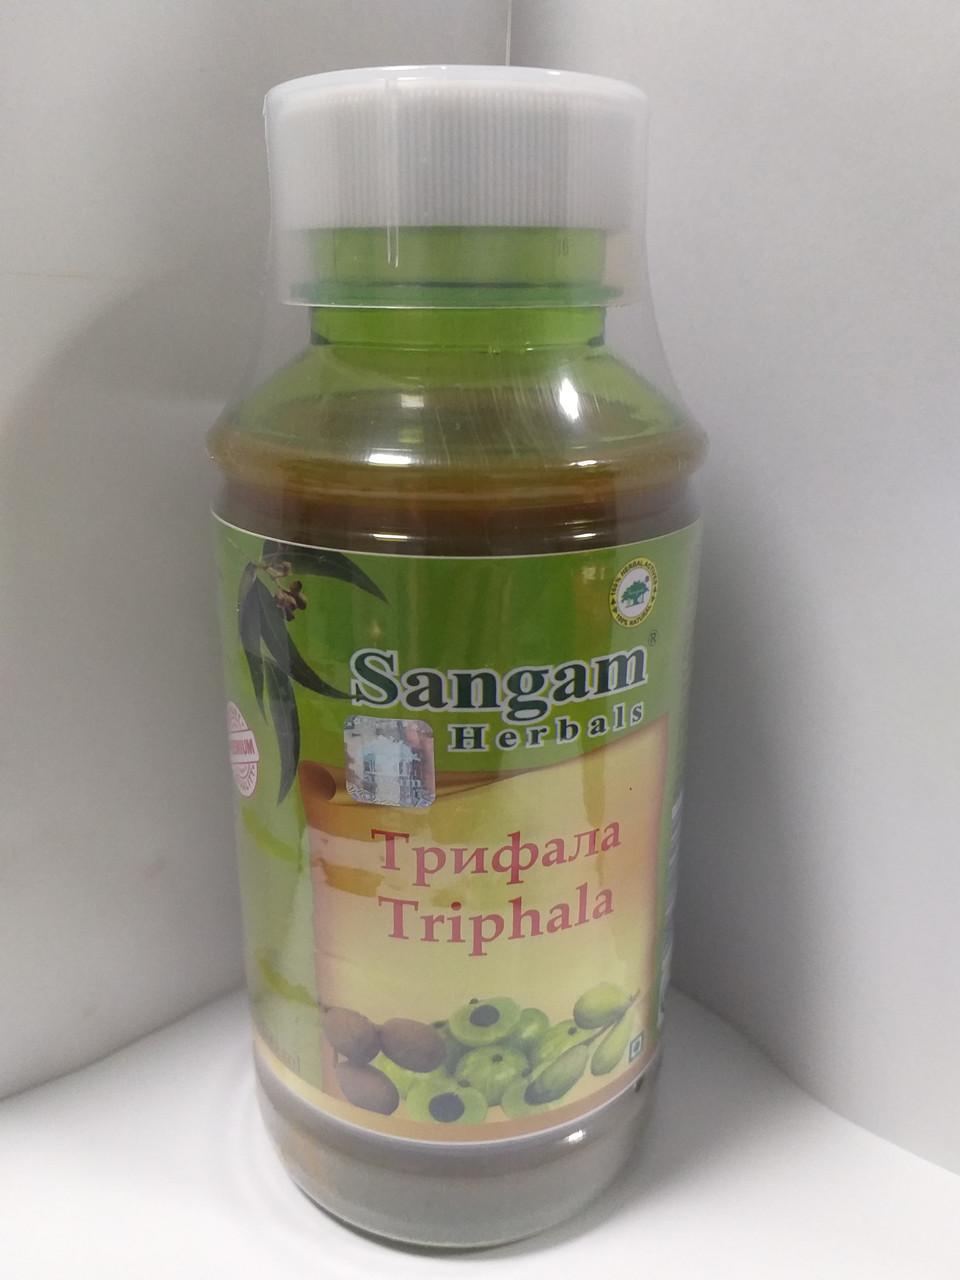 Сок Трифалы ,от компании Сангам 500 мл